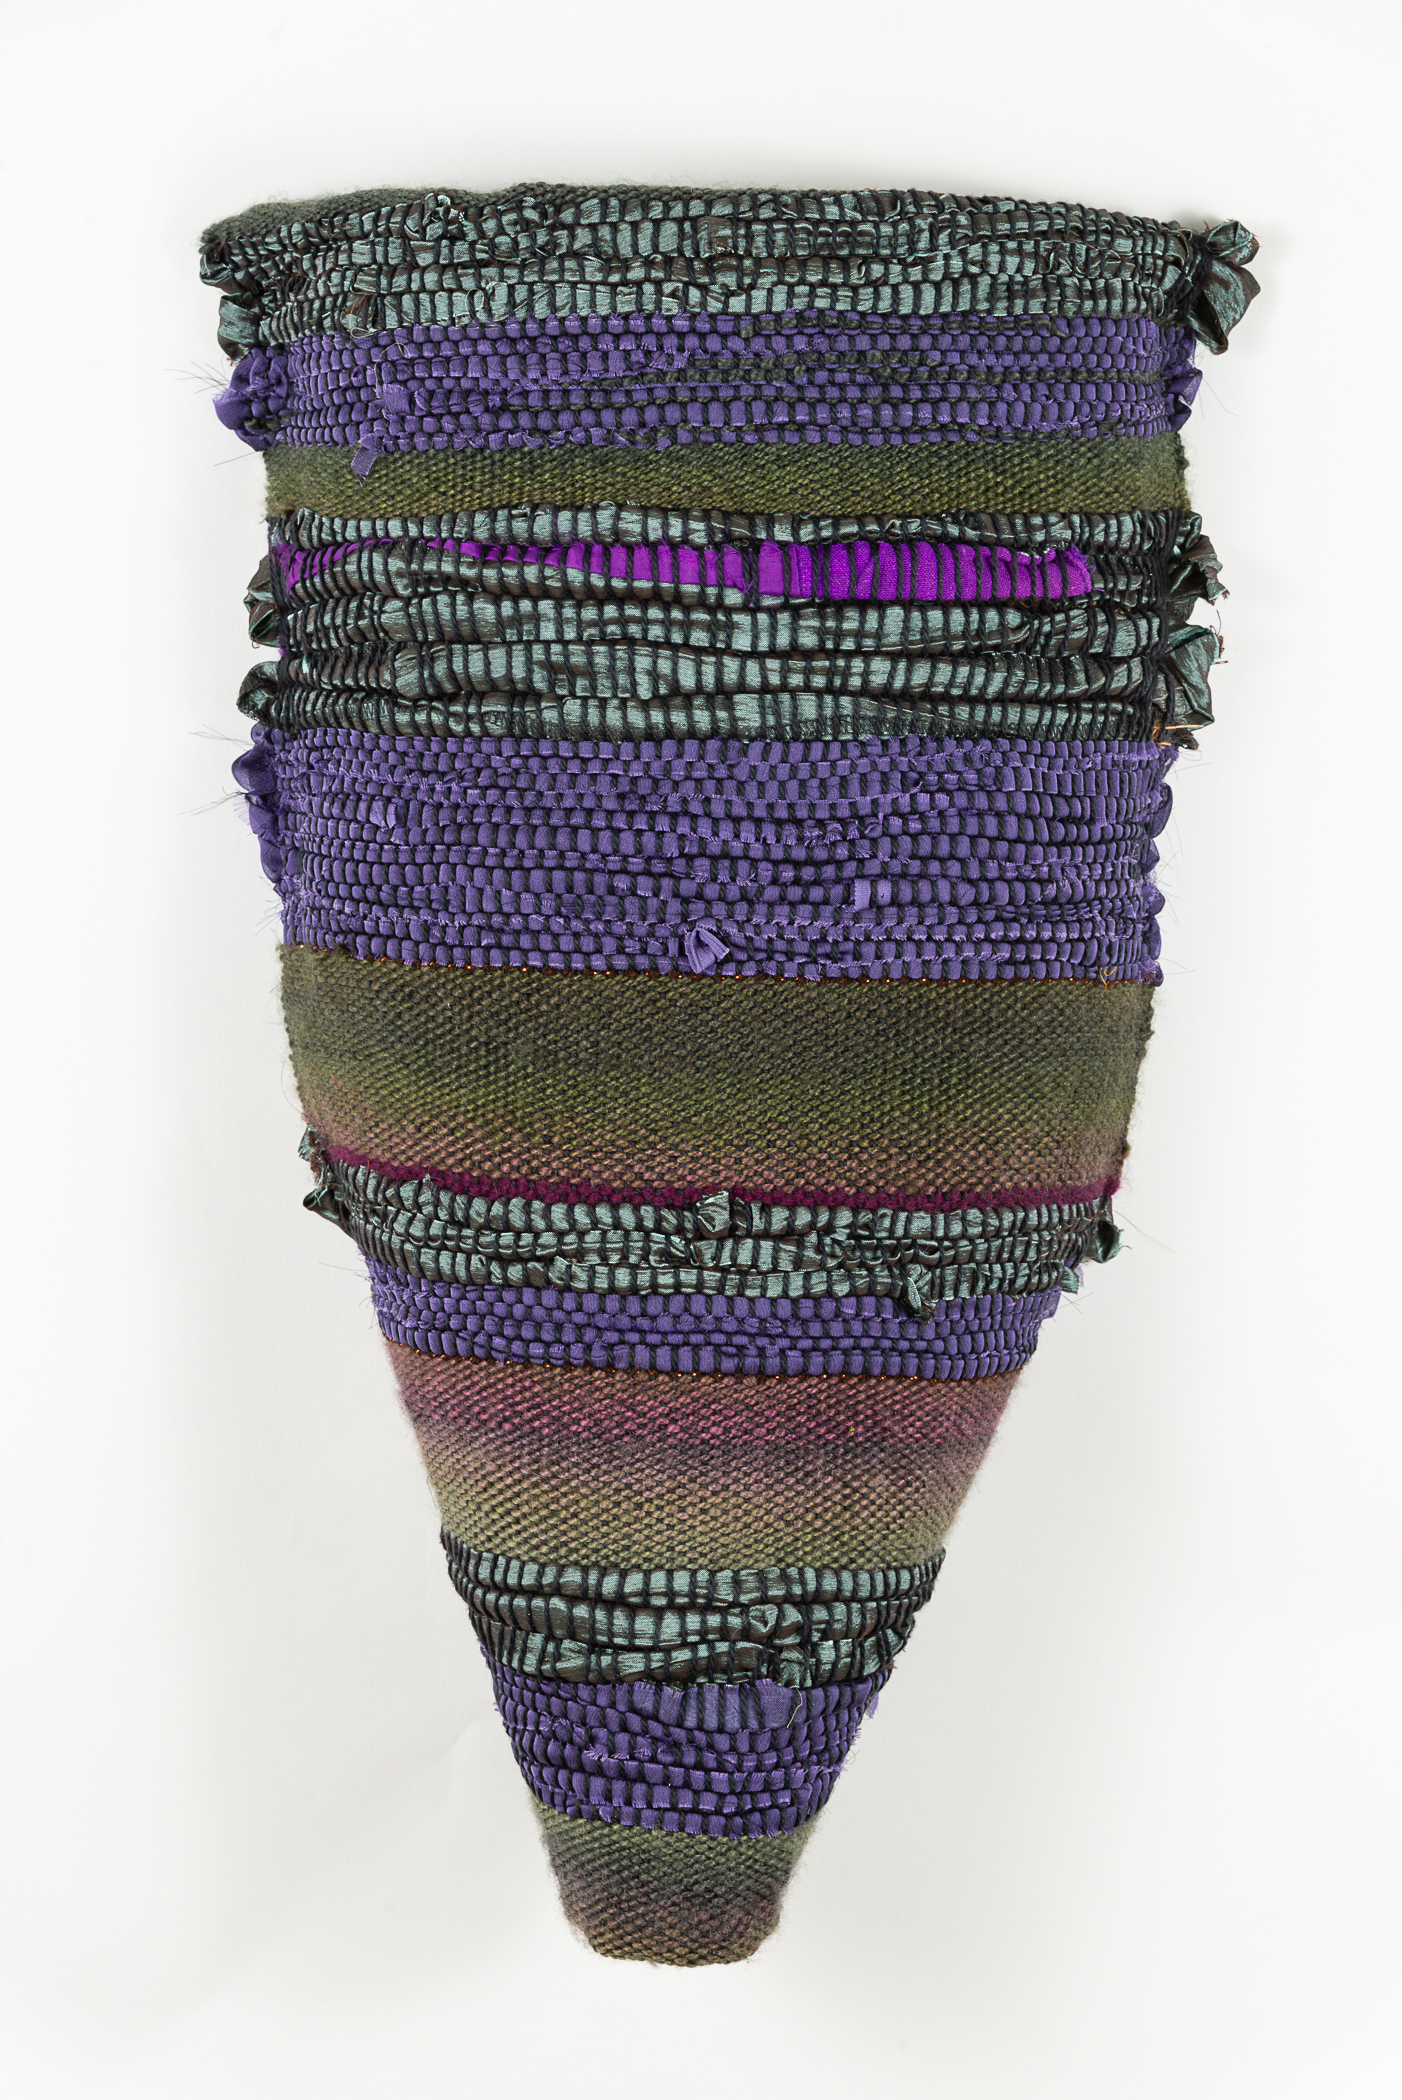 Sylvia Vander Sluis,  Torso (Purple/Turquoise)  Handwoven wool, silk, polyester, 20x12x3